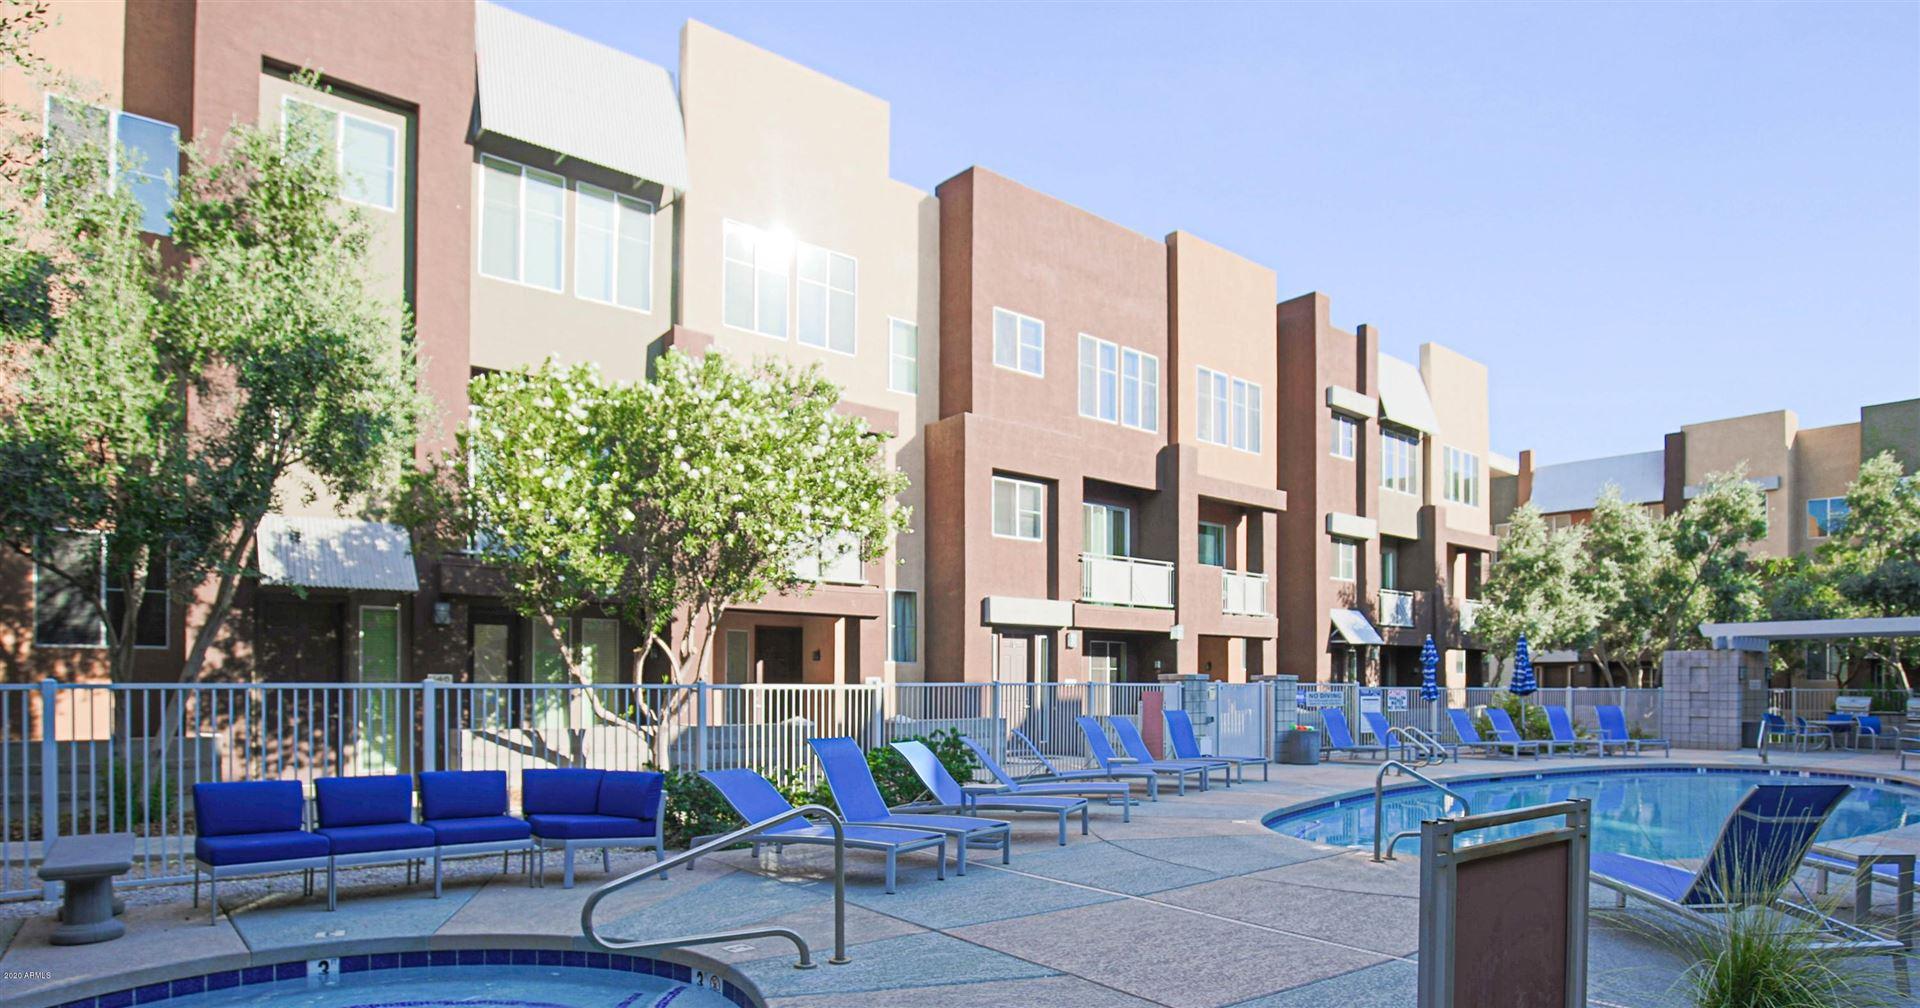 6745 N 93rd Avenue #1160, Glendale, AZ 85305 - MLS#: 6101590